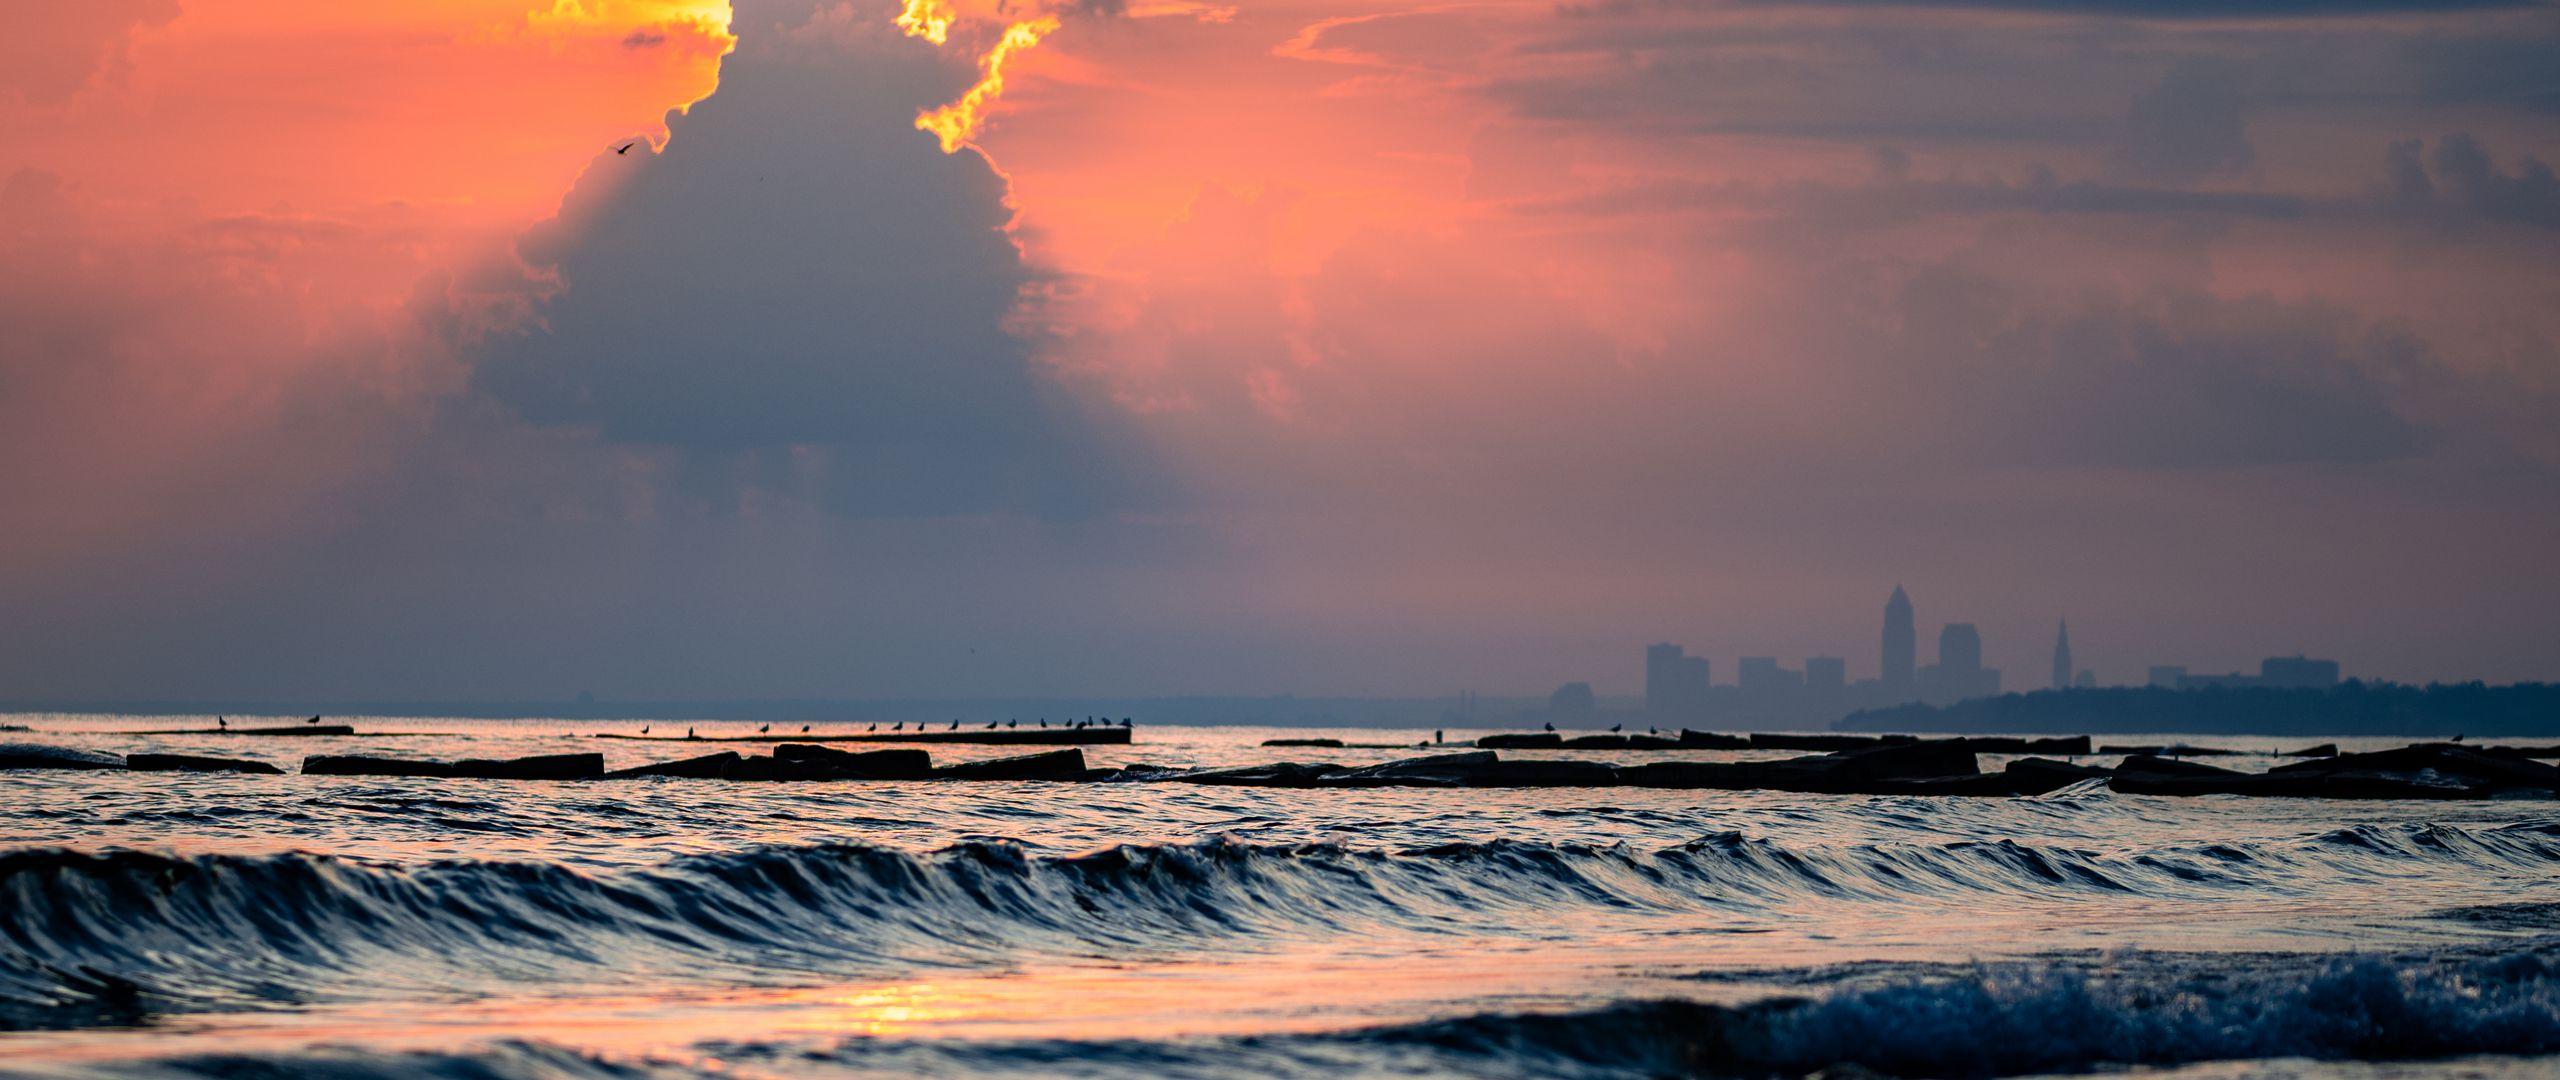 2560x1080 Wallpaper sea, waves, clouds, rays, sun, sunset